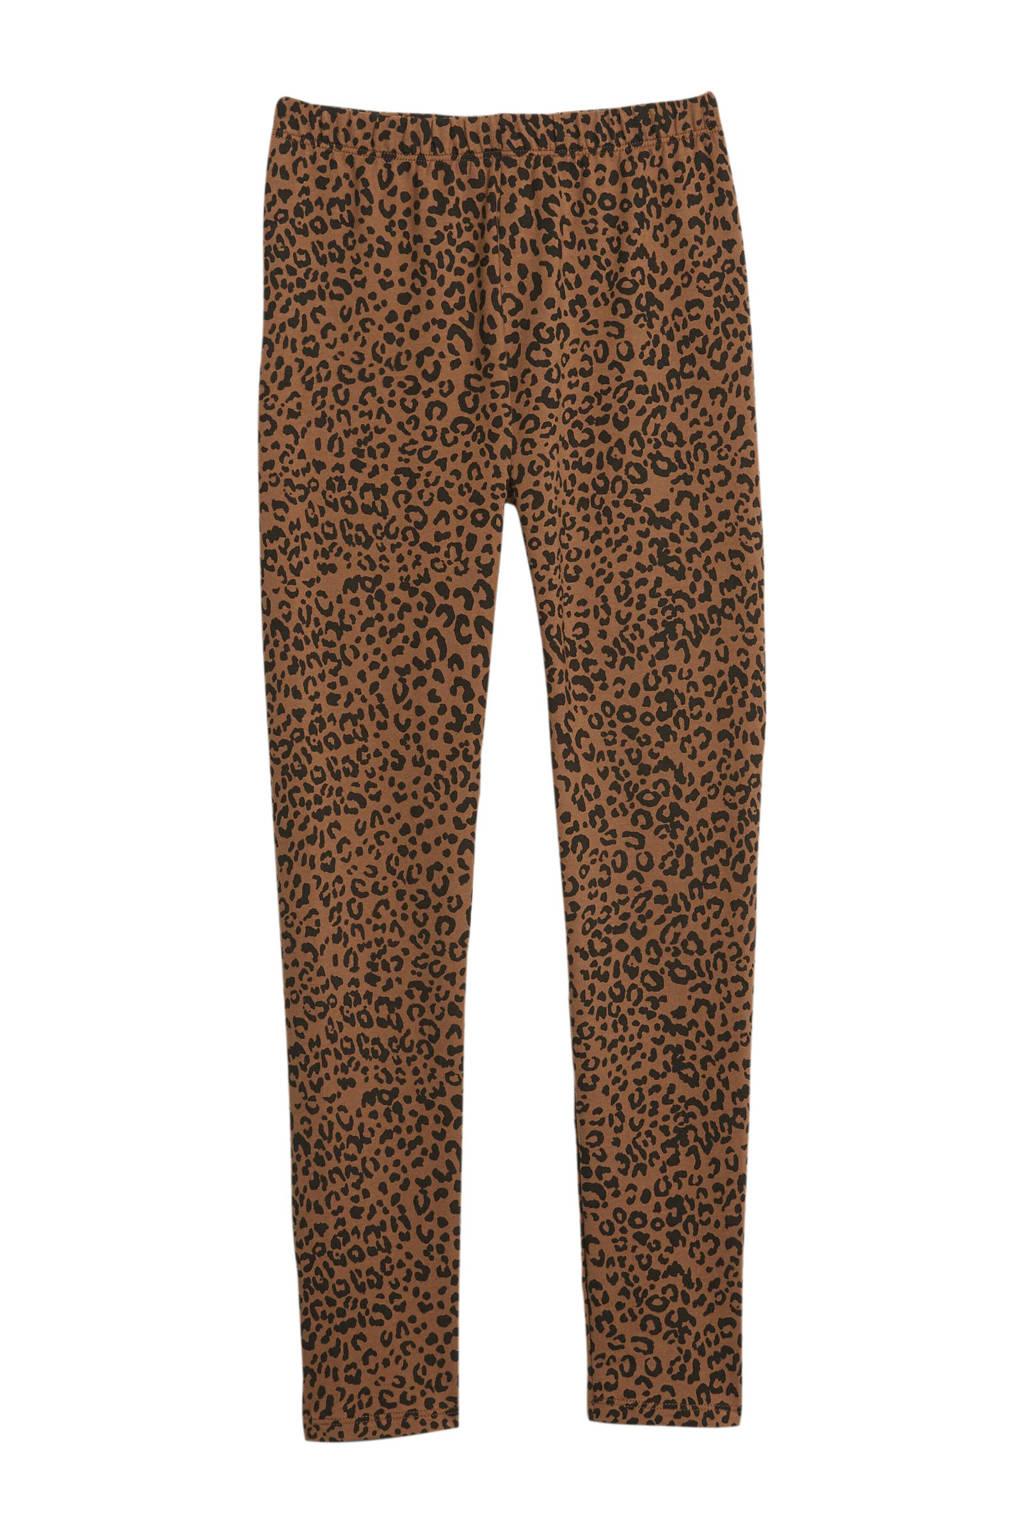 GAP legging met panterprint bruin/zwart, Bruin/zwart